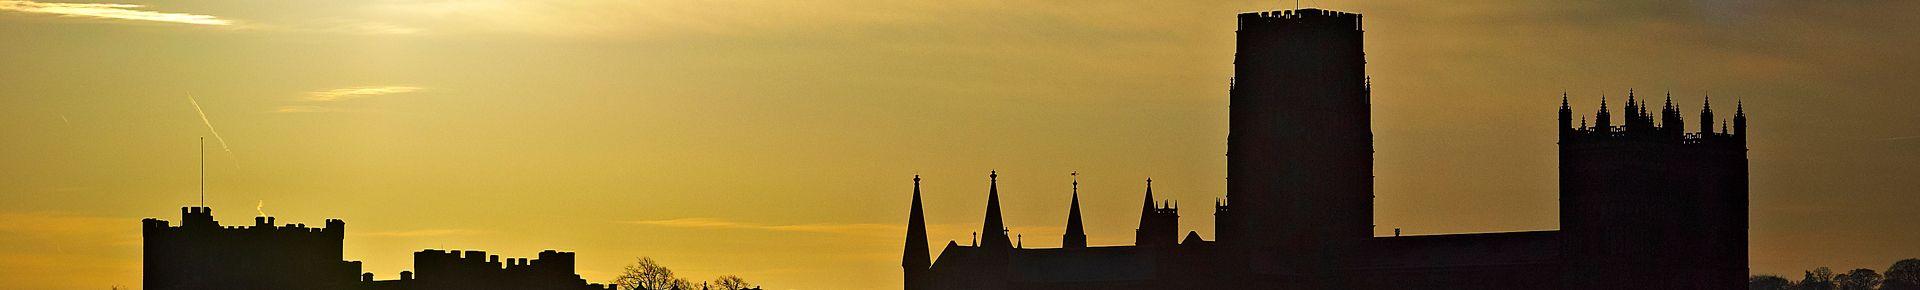 Durham City skyline at sunset